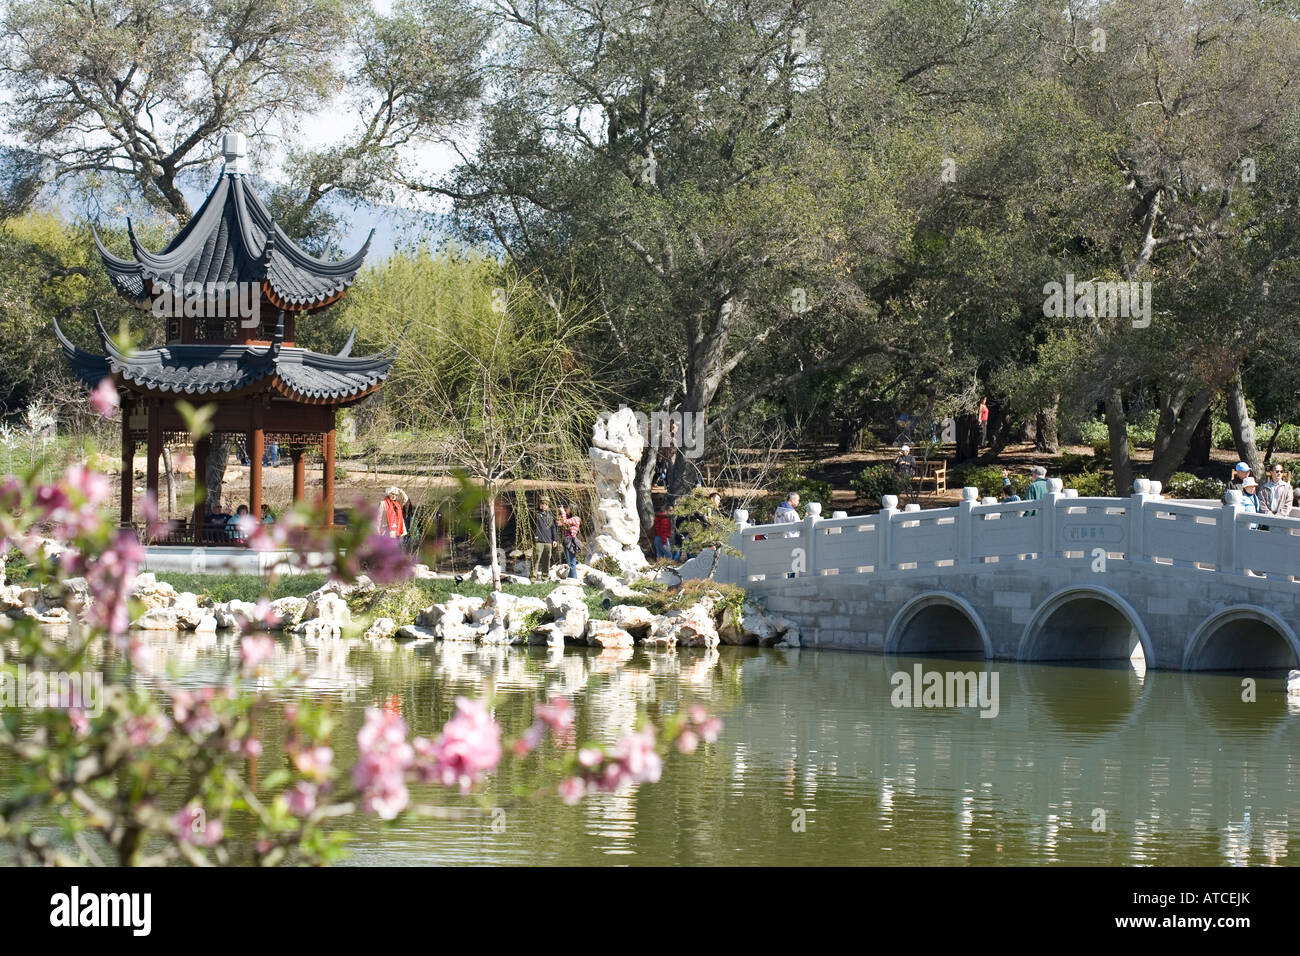 Chinese Garden At The Huntington Gardens, Pasadena, California USA Liu Fang  Yuan Or Flowing